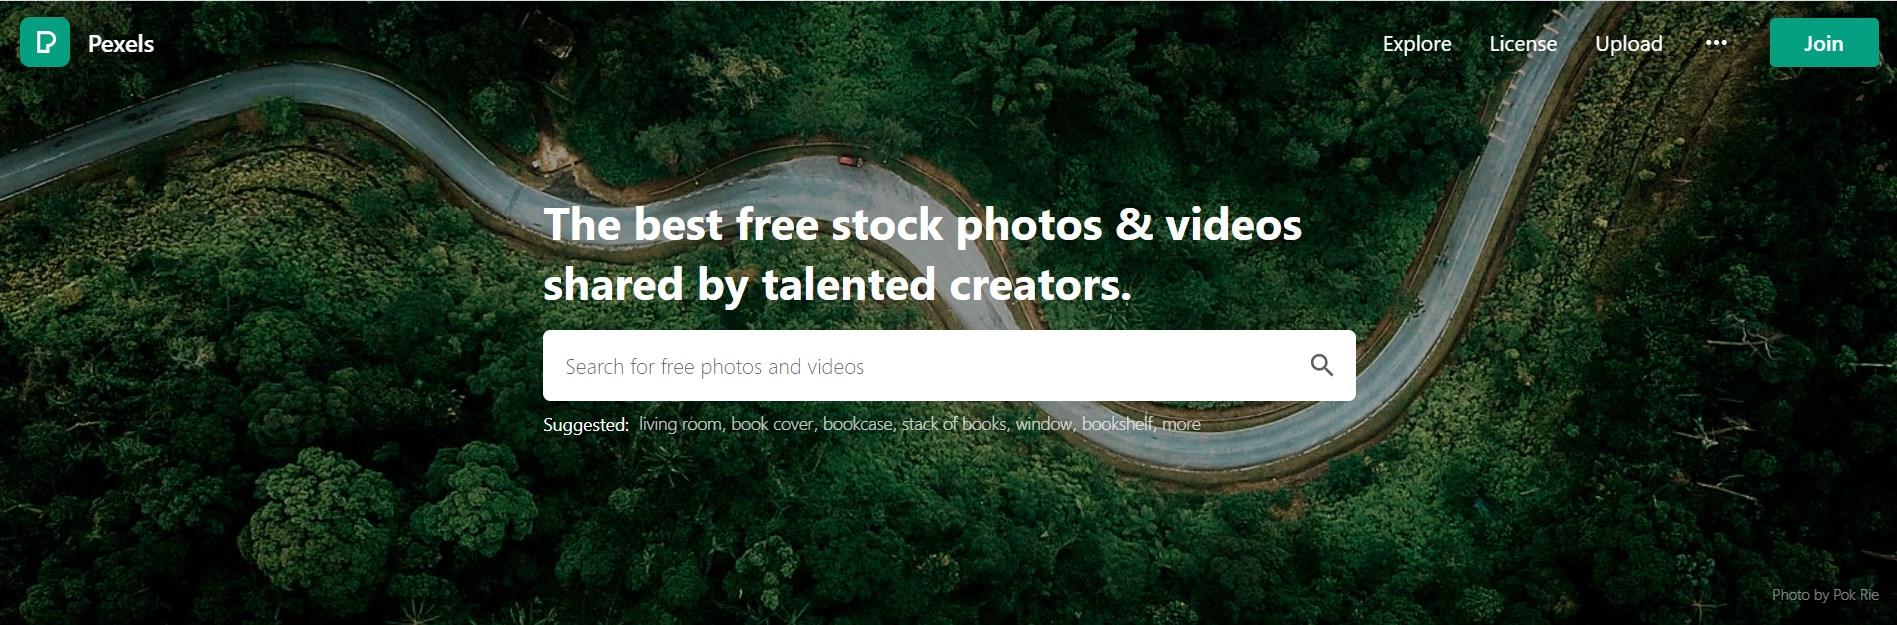 Pexels free stock images website - bigwigblooger